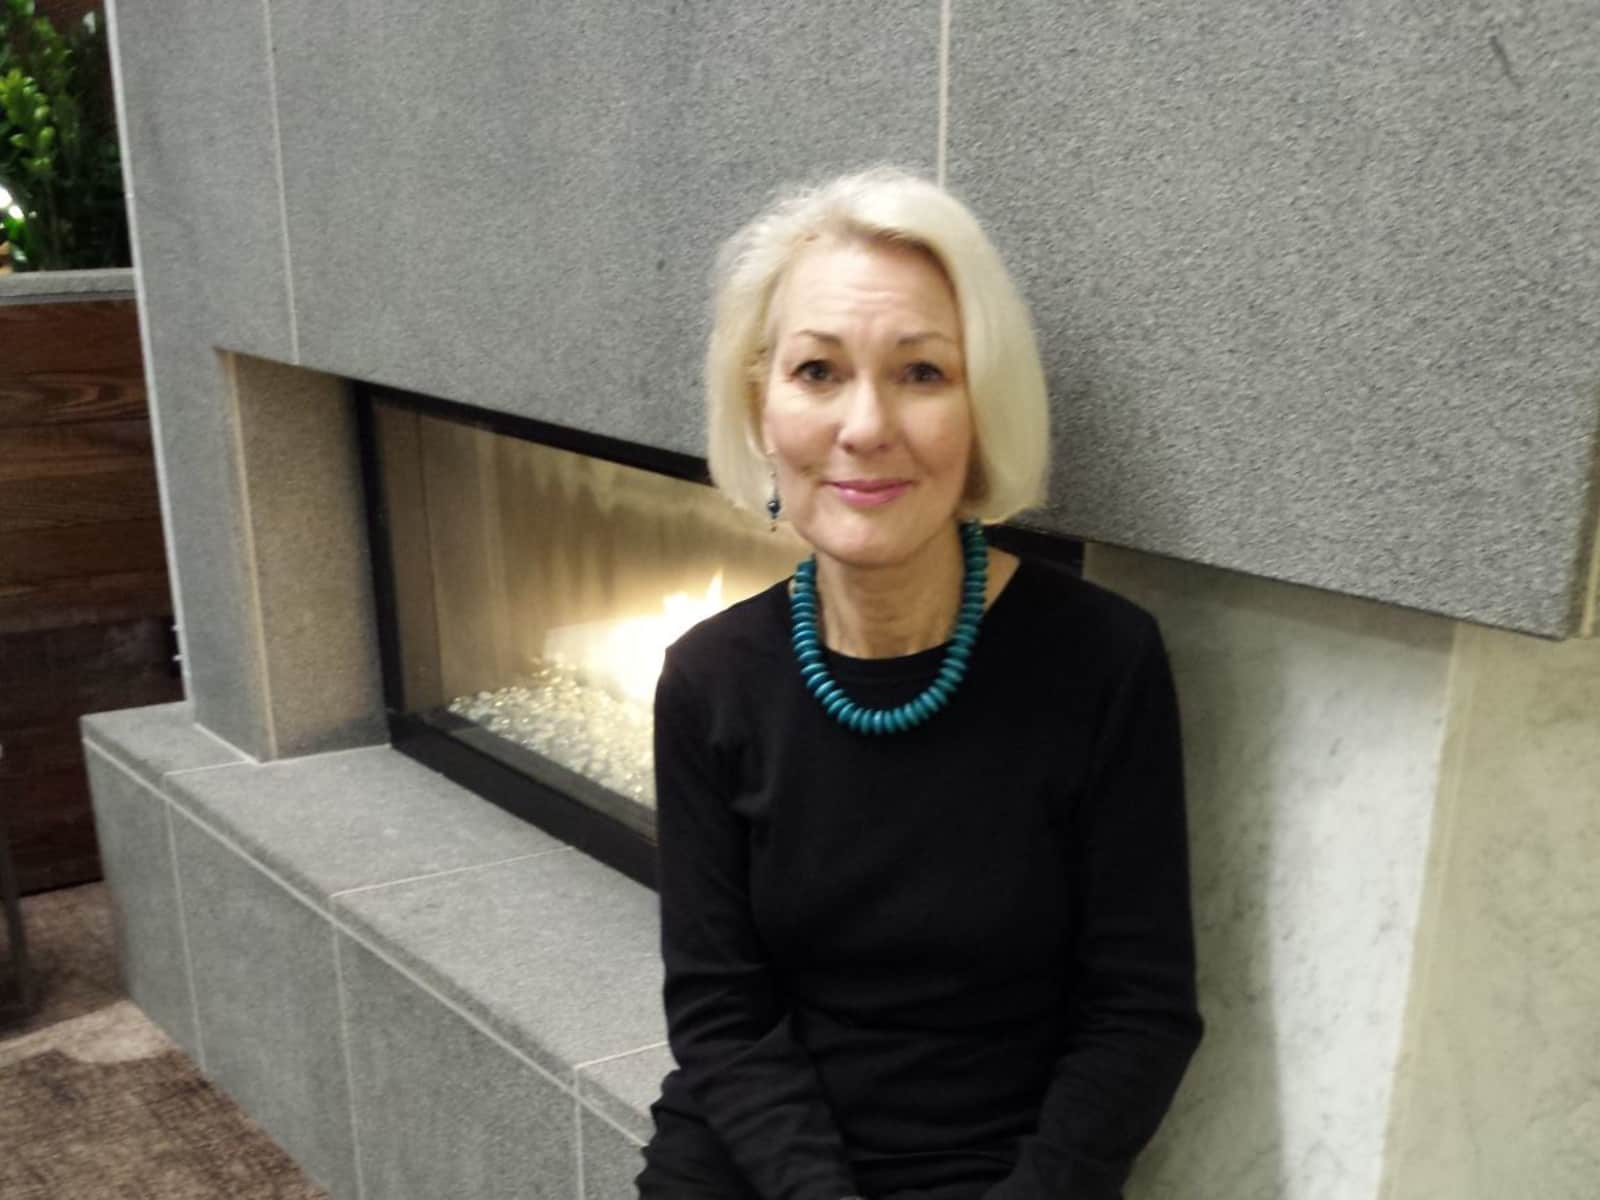 Ann from Takoma Park, Maryland, United States